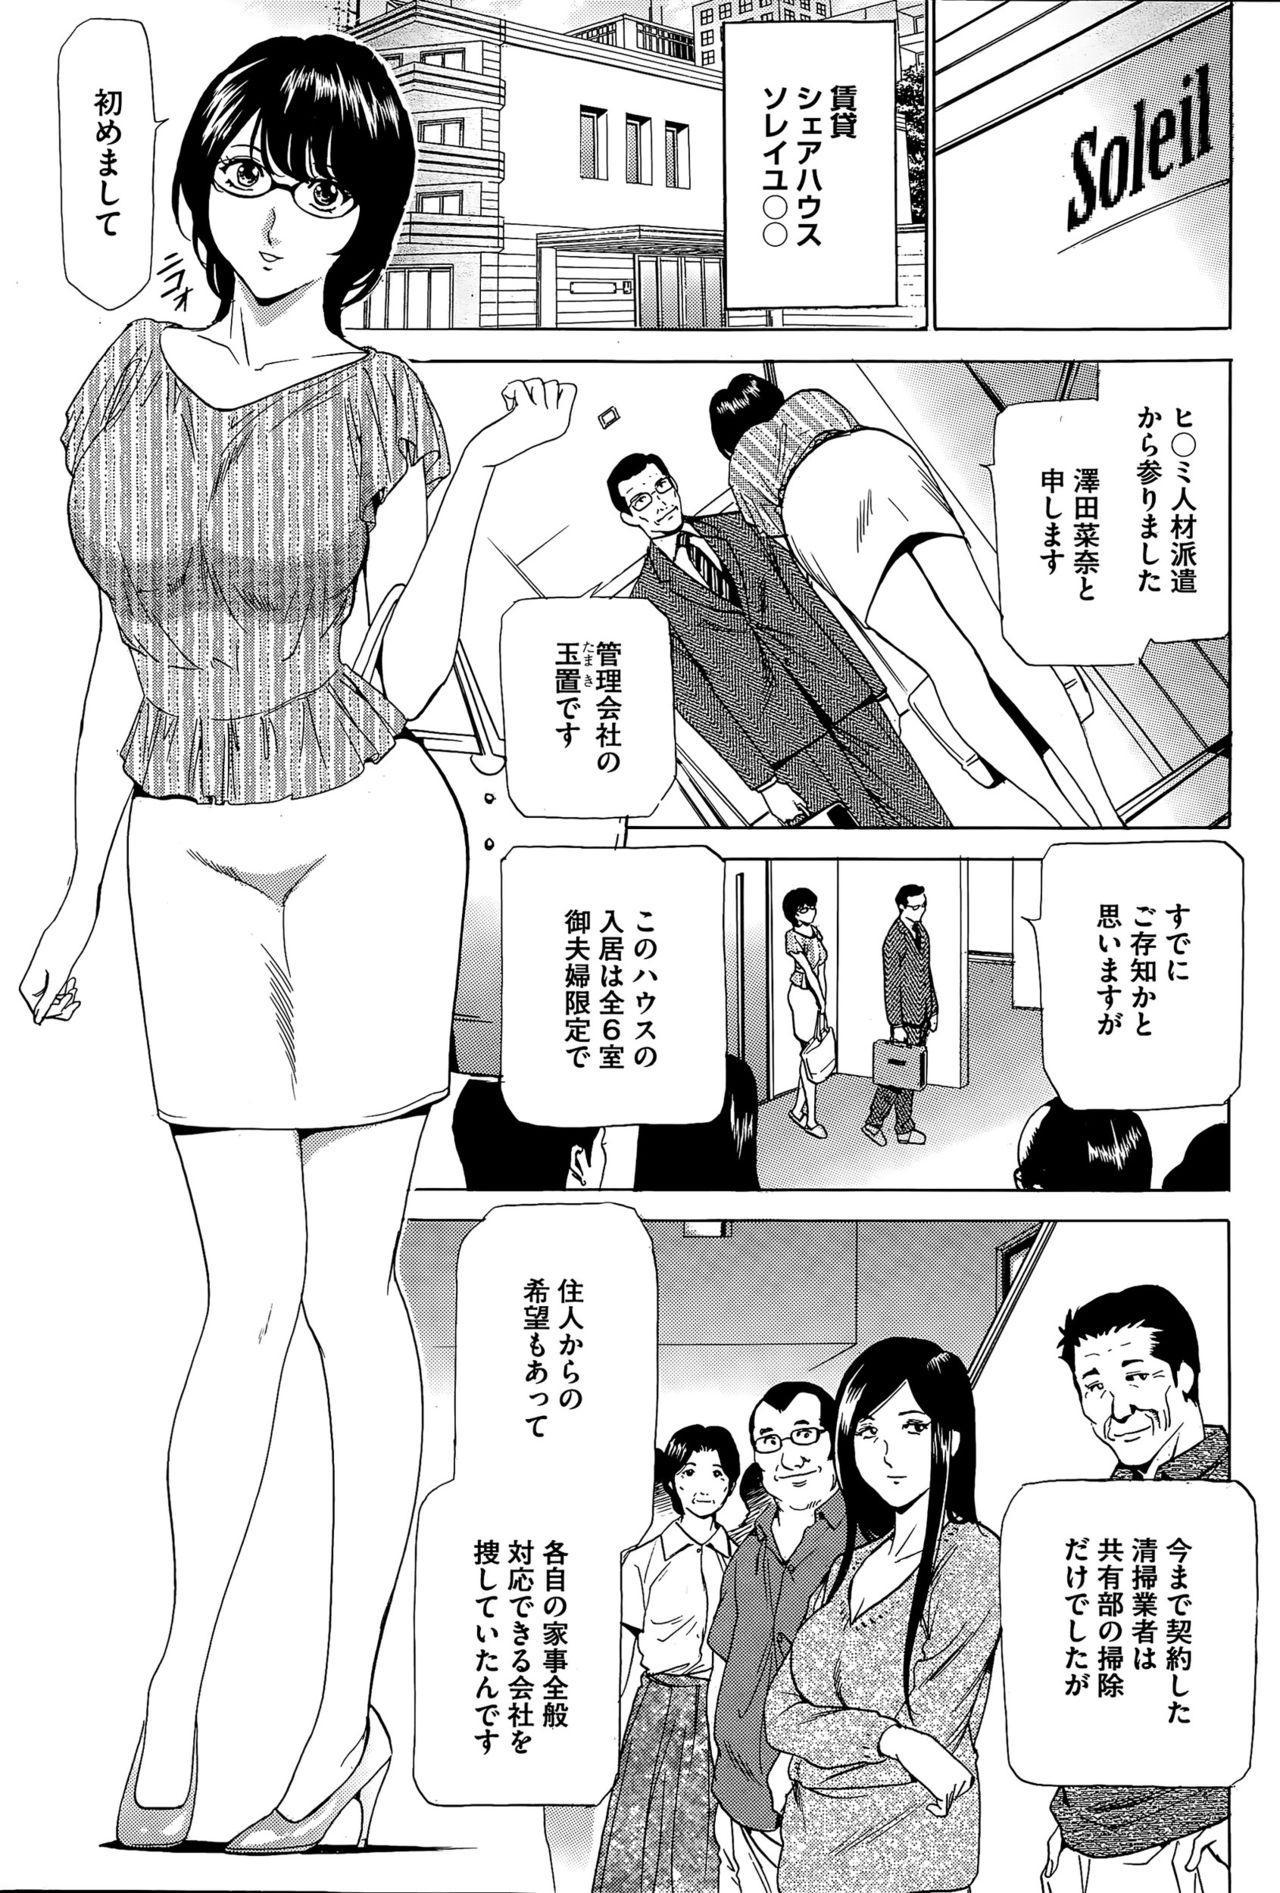 Wa Usuki Ipa a 1-10 3